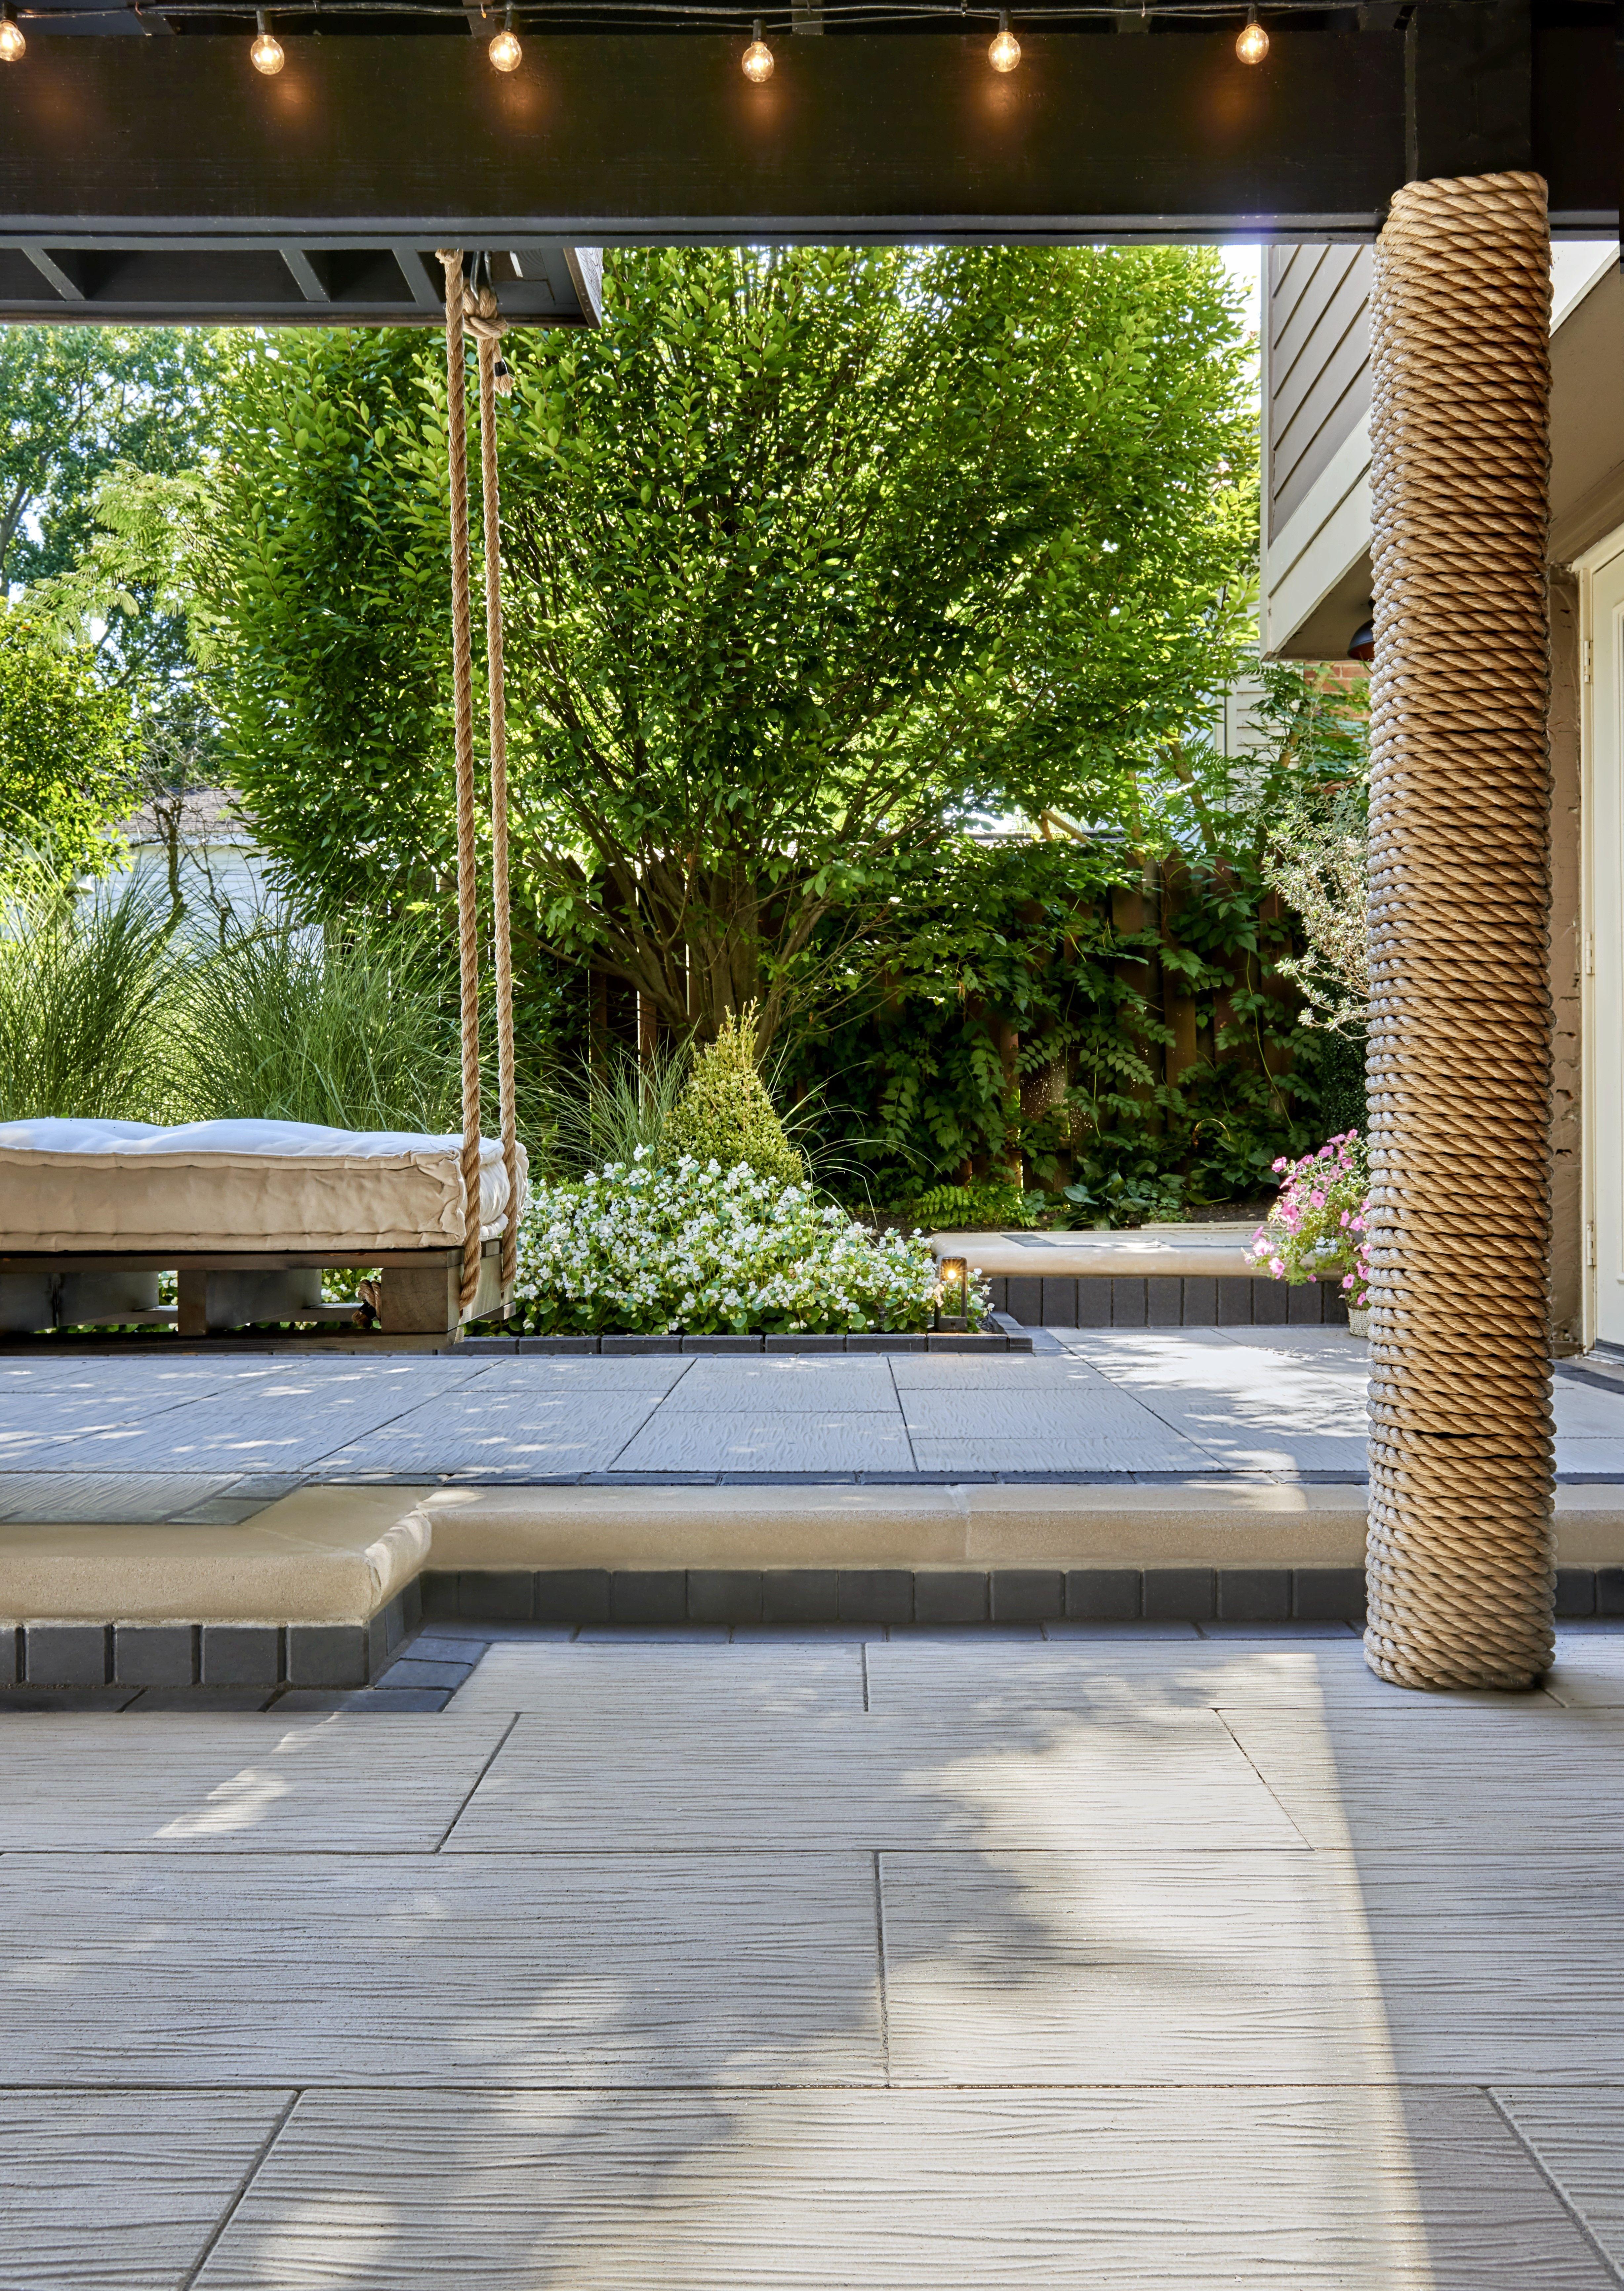 This Backyard Patio Design Is Inspired By Our Ocean Grande Patio Slab The Ocean Grande Provides An Extremely In 2020 Backyard Patio Designs Backyard Patio Patio Slabs